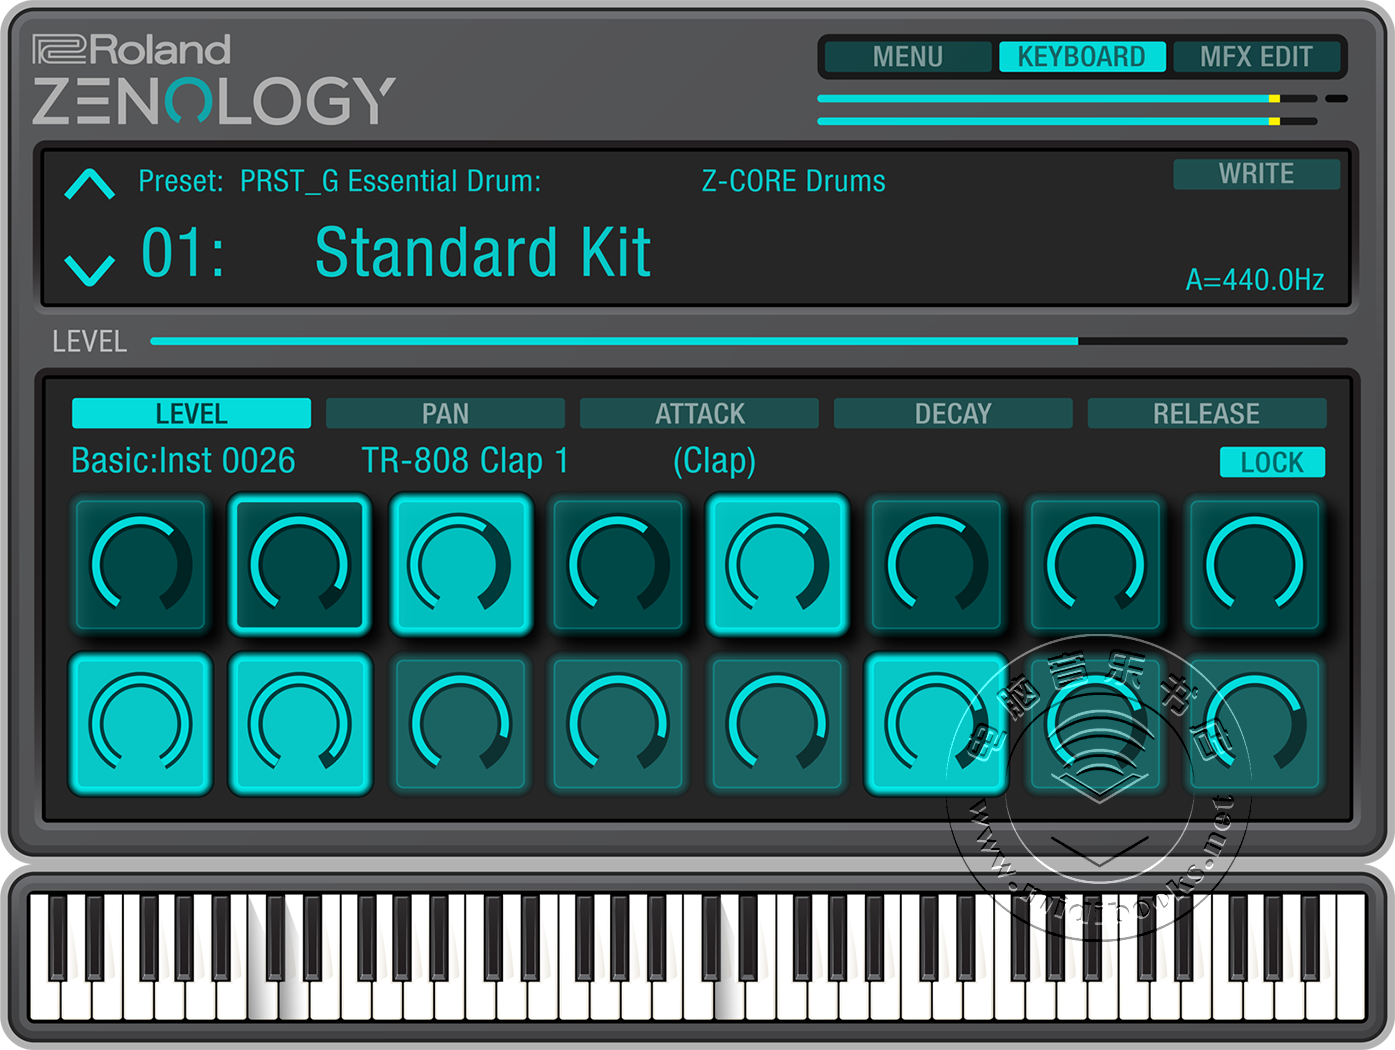 Roland推出ZENOLOGY(禅学)软件合成器(视频)